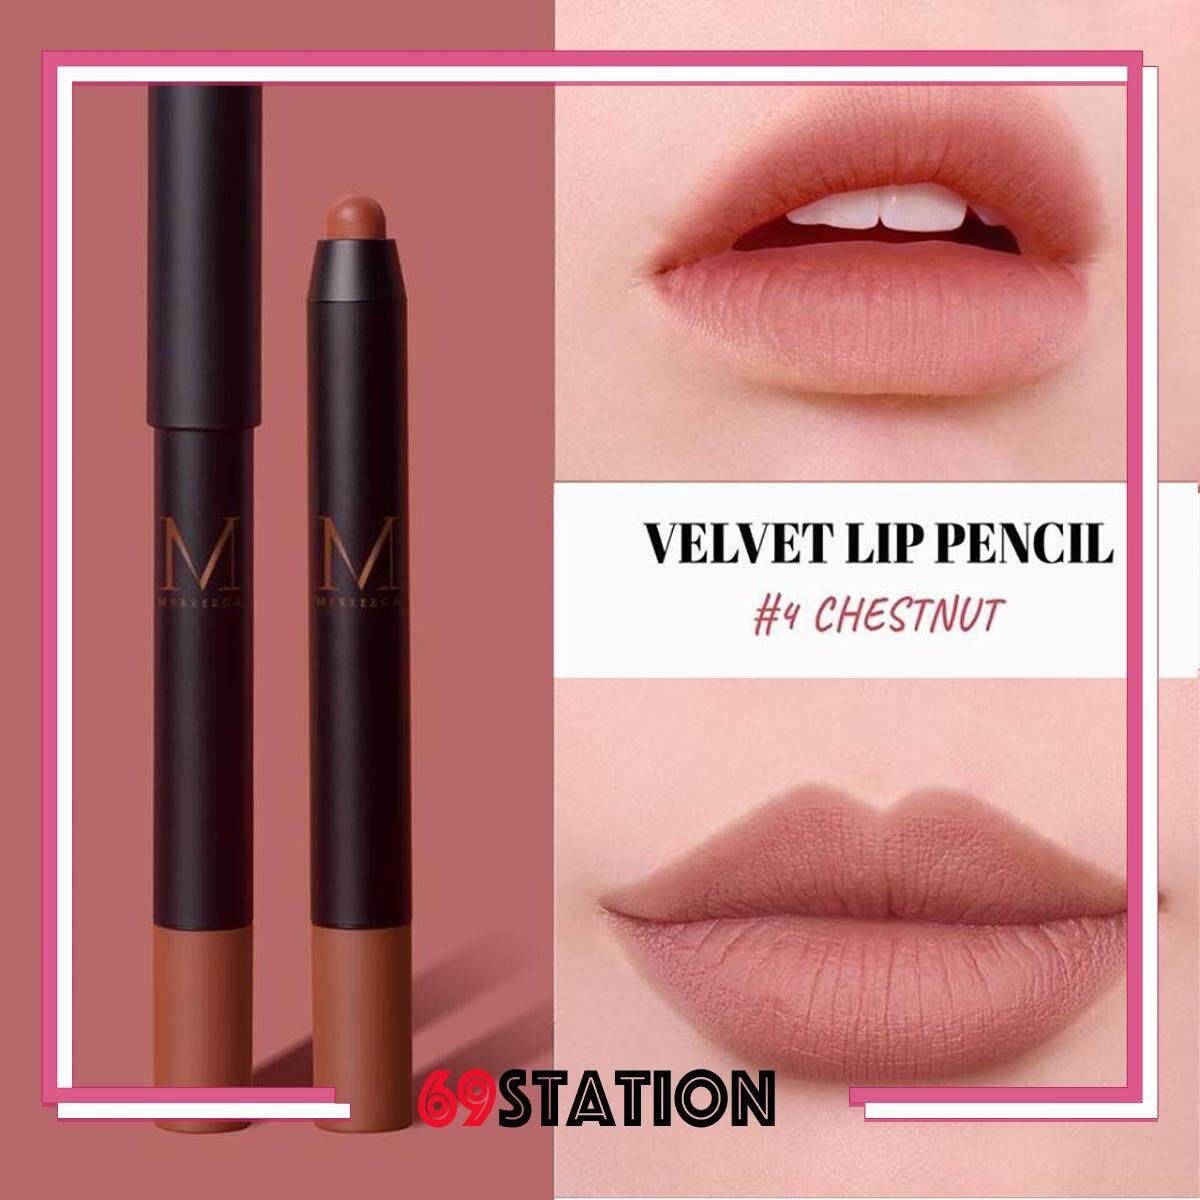 1 Velvet Merrezca กันน้ำ เมอเรสก้า เนื้อแมท ลิปดินสอ 3g Pencil Lip